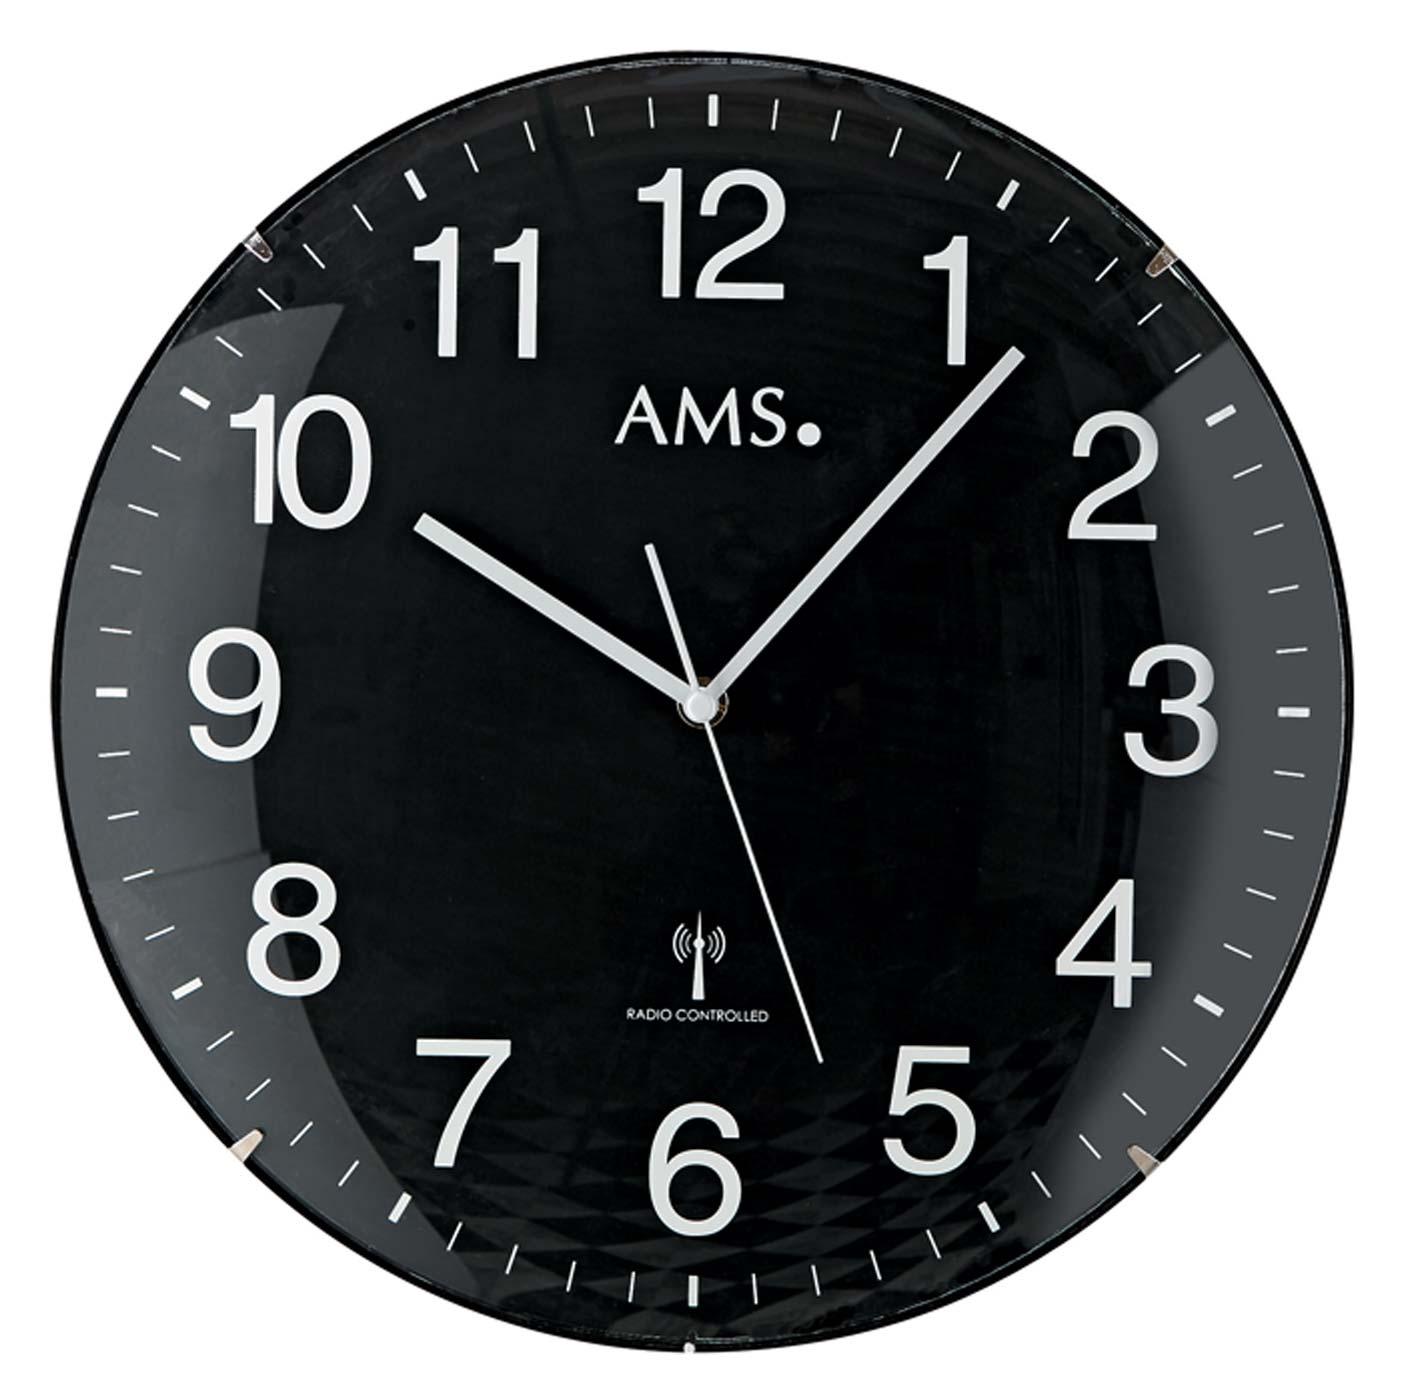 ams 5959 horloge murale horloge de gare horloge de bureau nouveau ebay. Black Bedroom Furniture Sets. Home Design Ideas